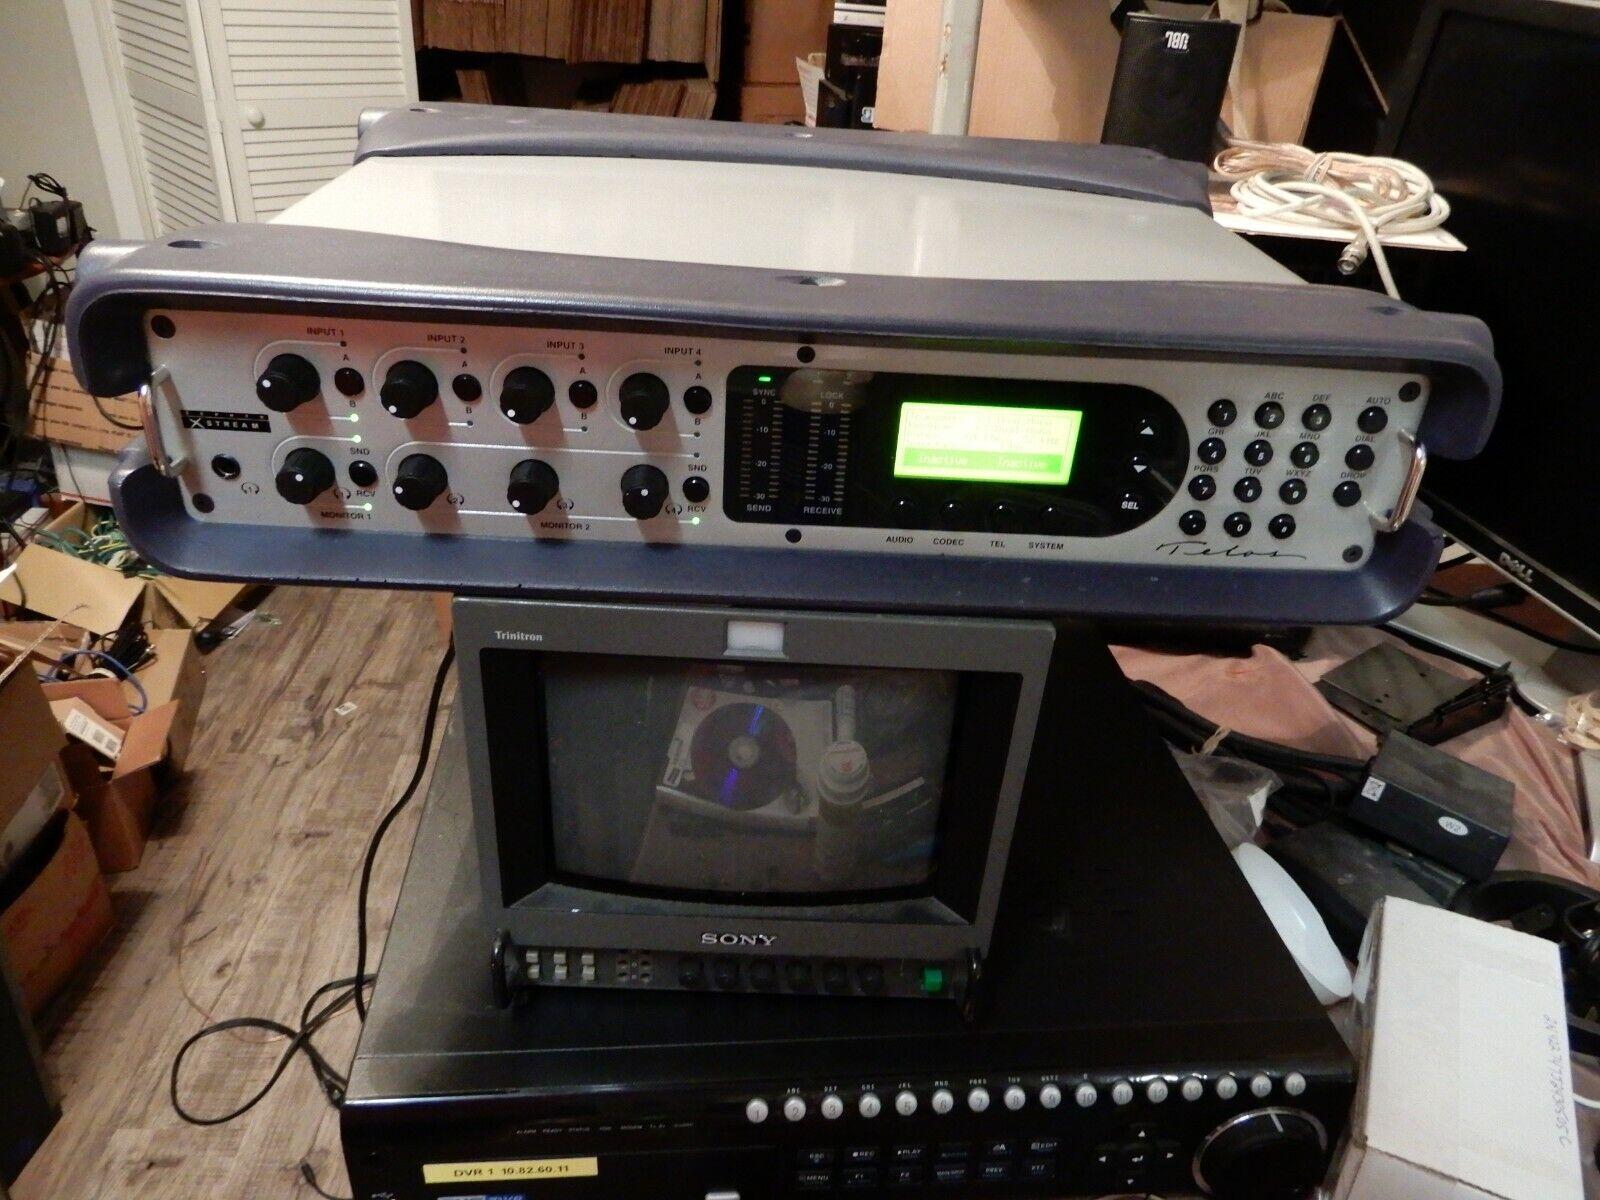 TELOS Zephyr Xstream MX ISDN Codec Digital Audio Transceiver w  4 Channel Mixer